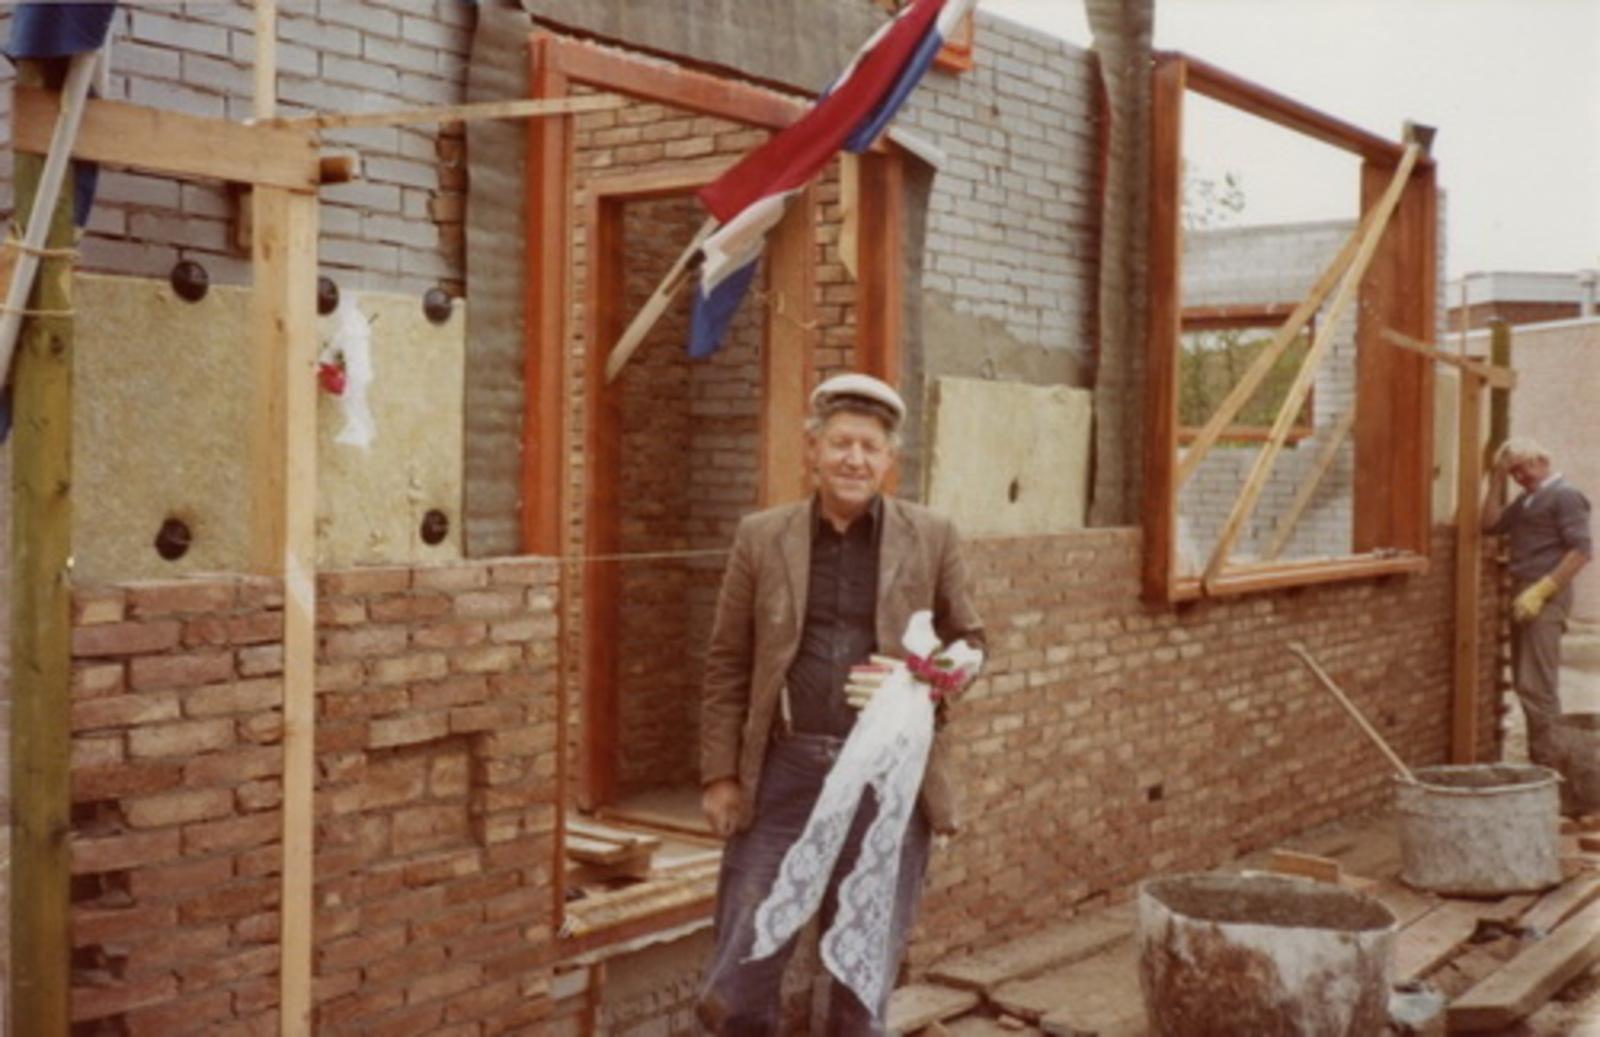 Marktplein N 0037 1978 Nieuwbouw huize aannemer den Ouden 02